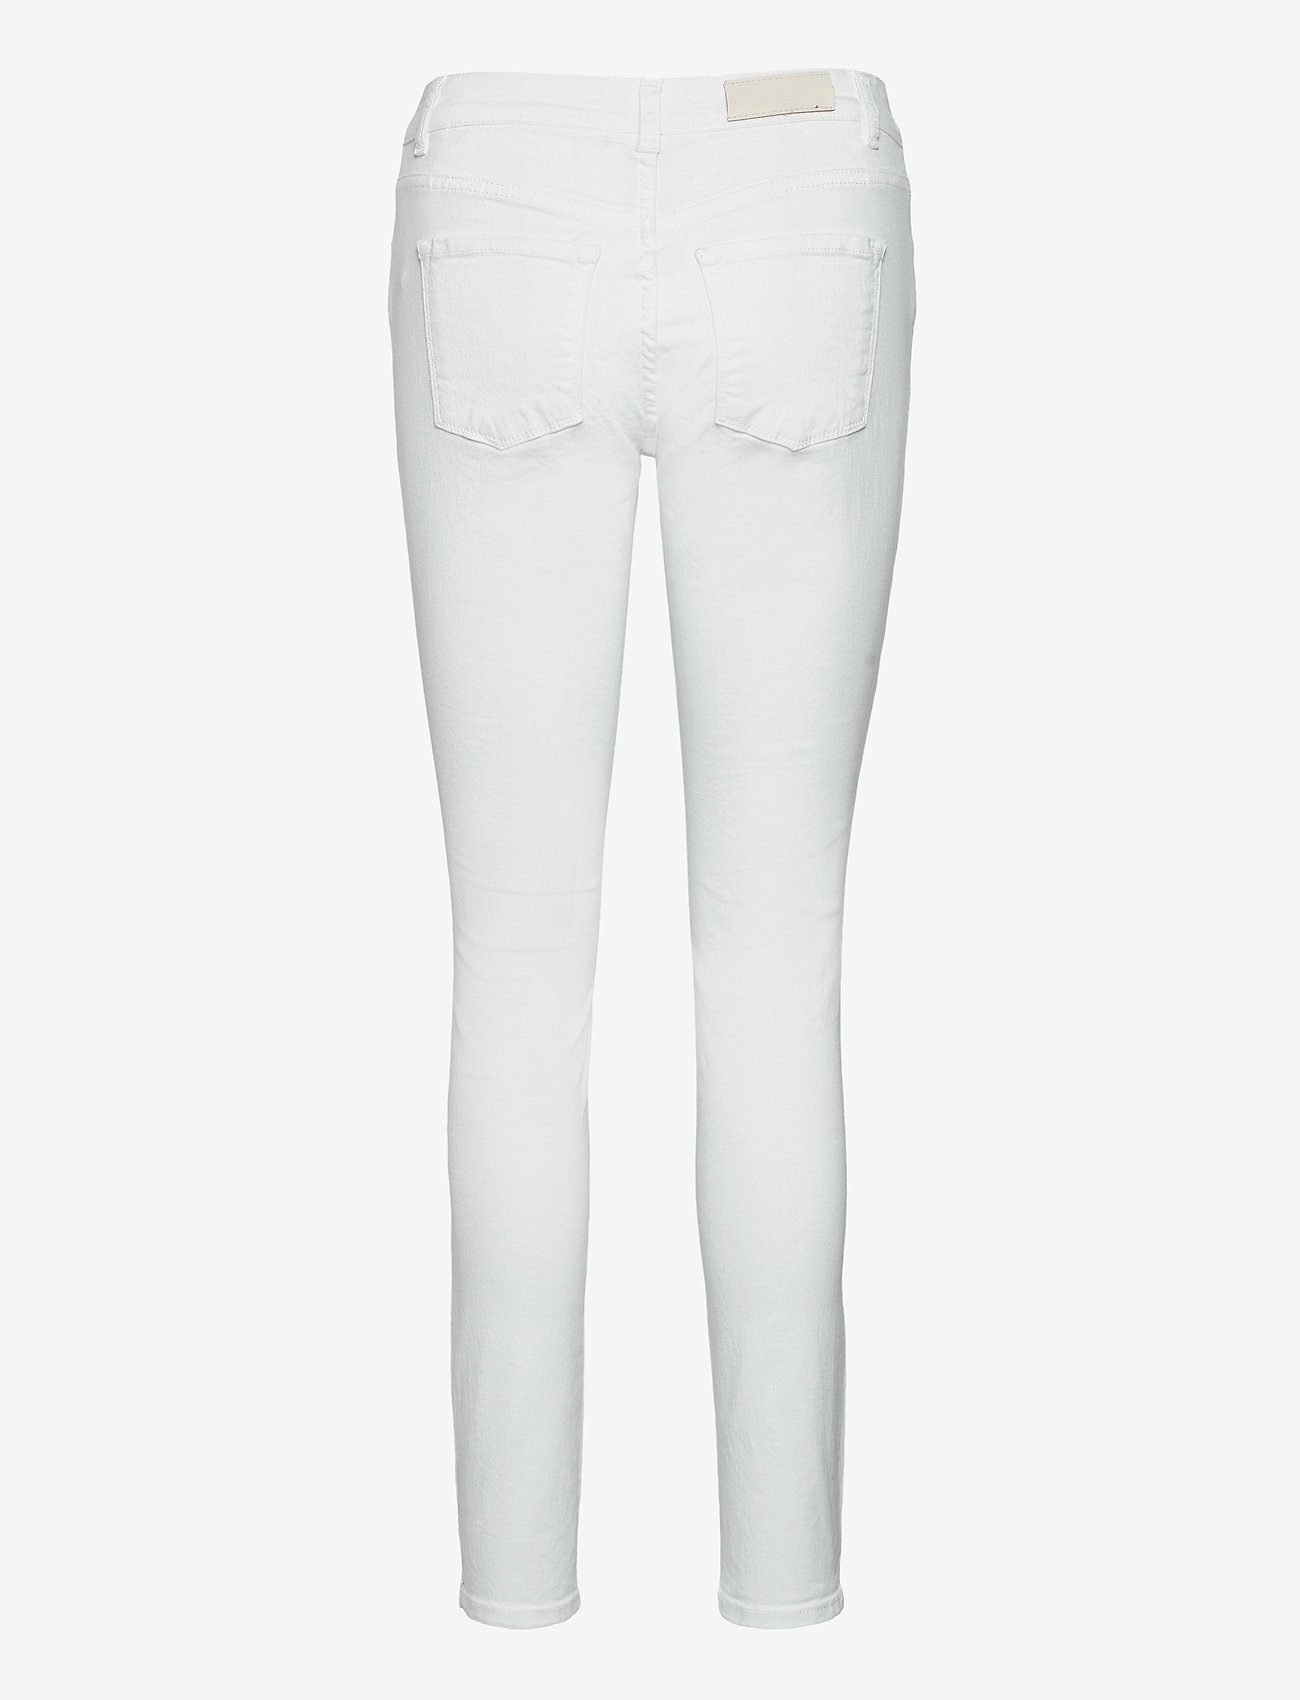 Morris Lady - Monroe Jeans - skinny jeans - white - 1